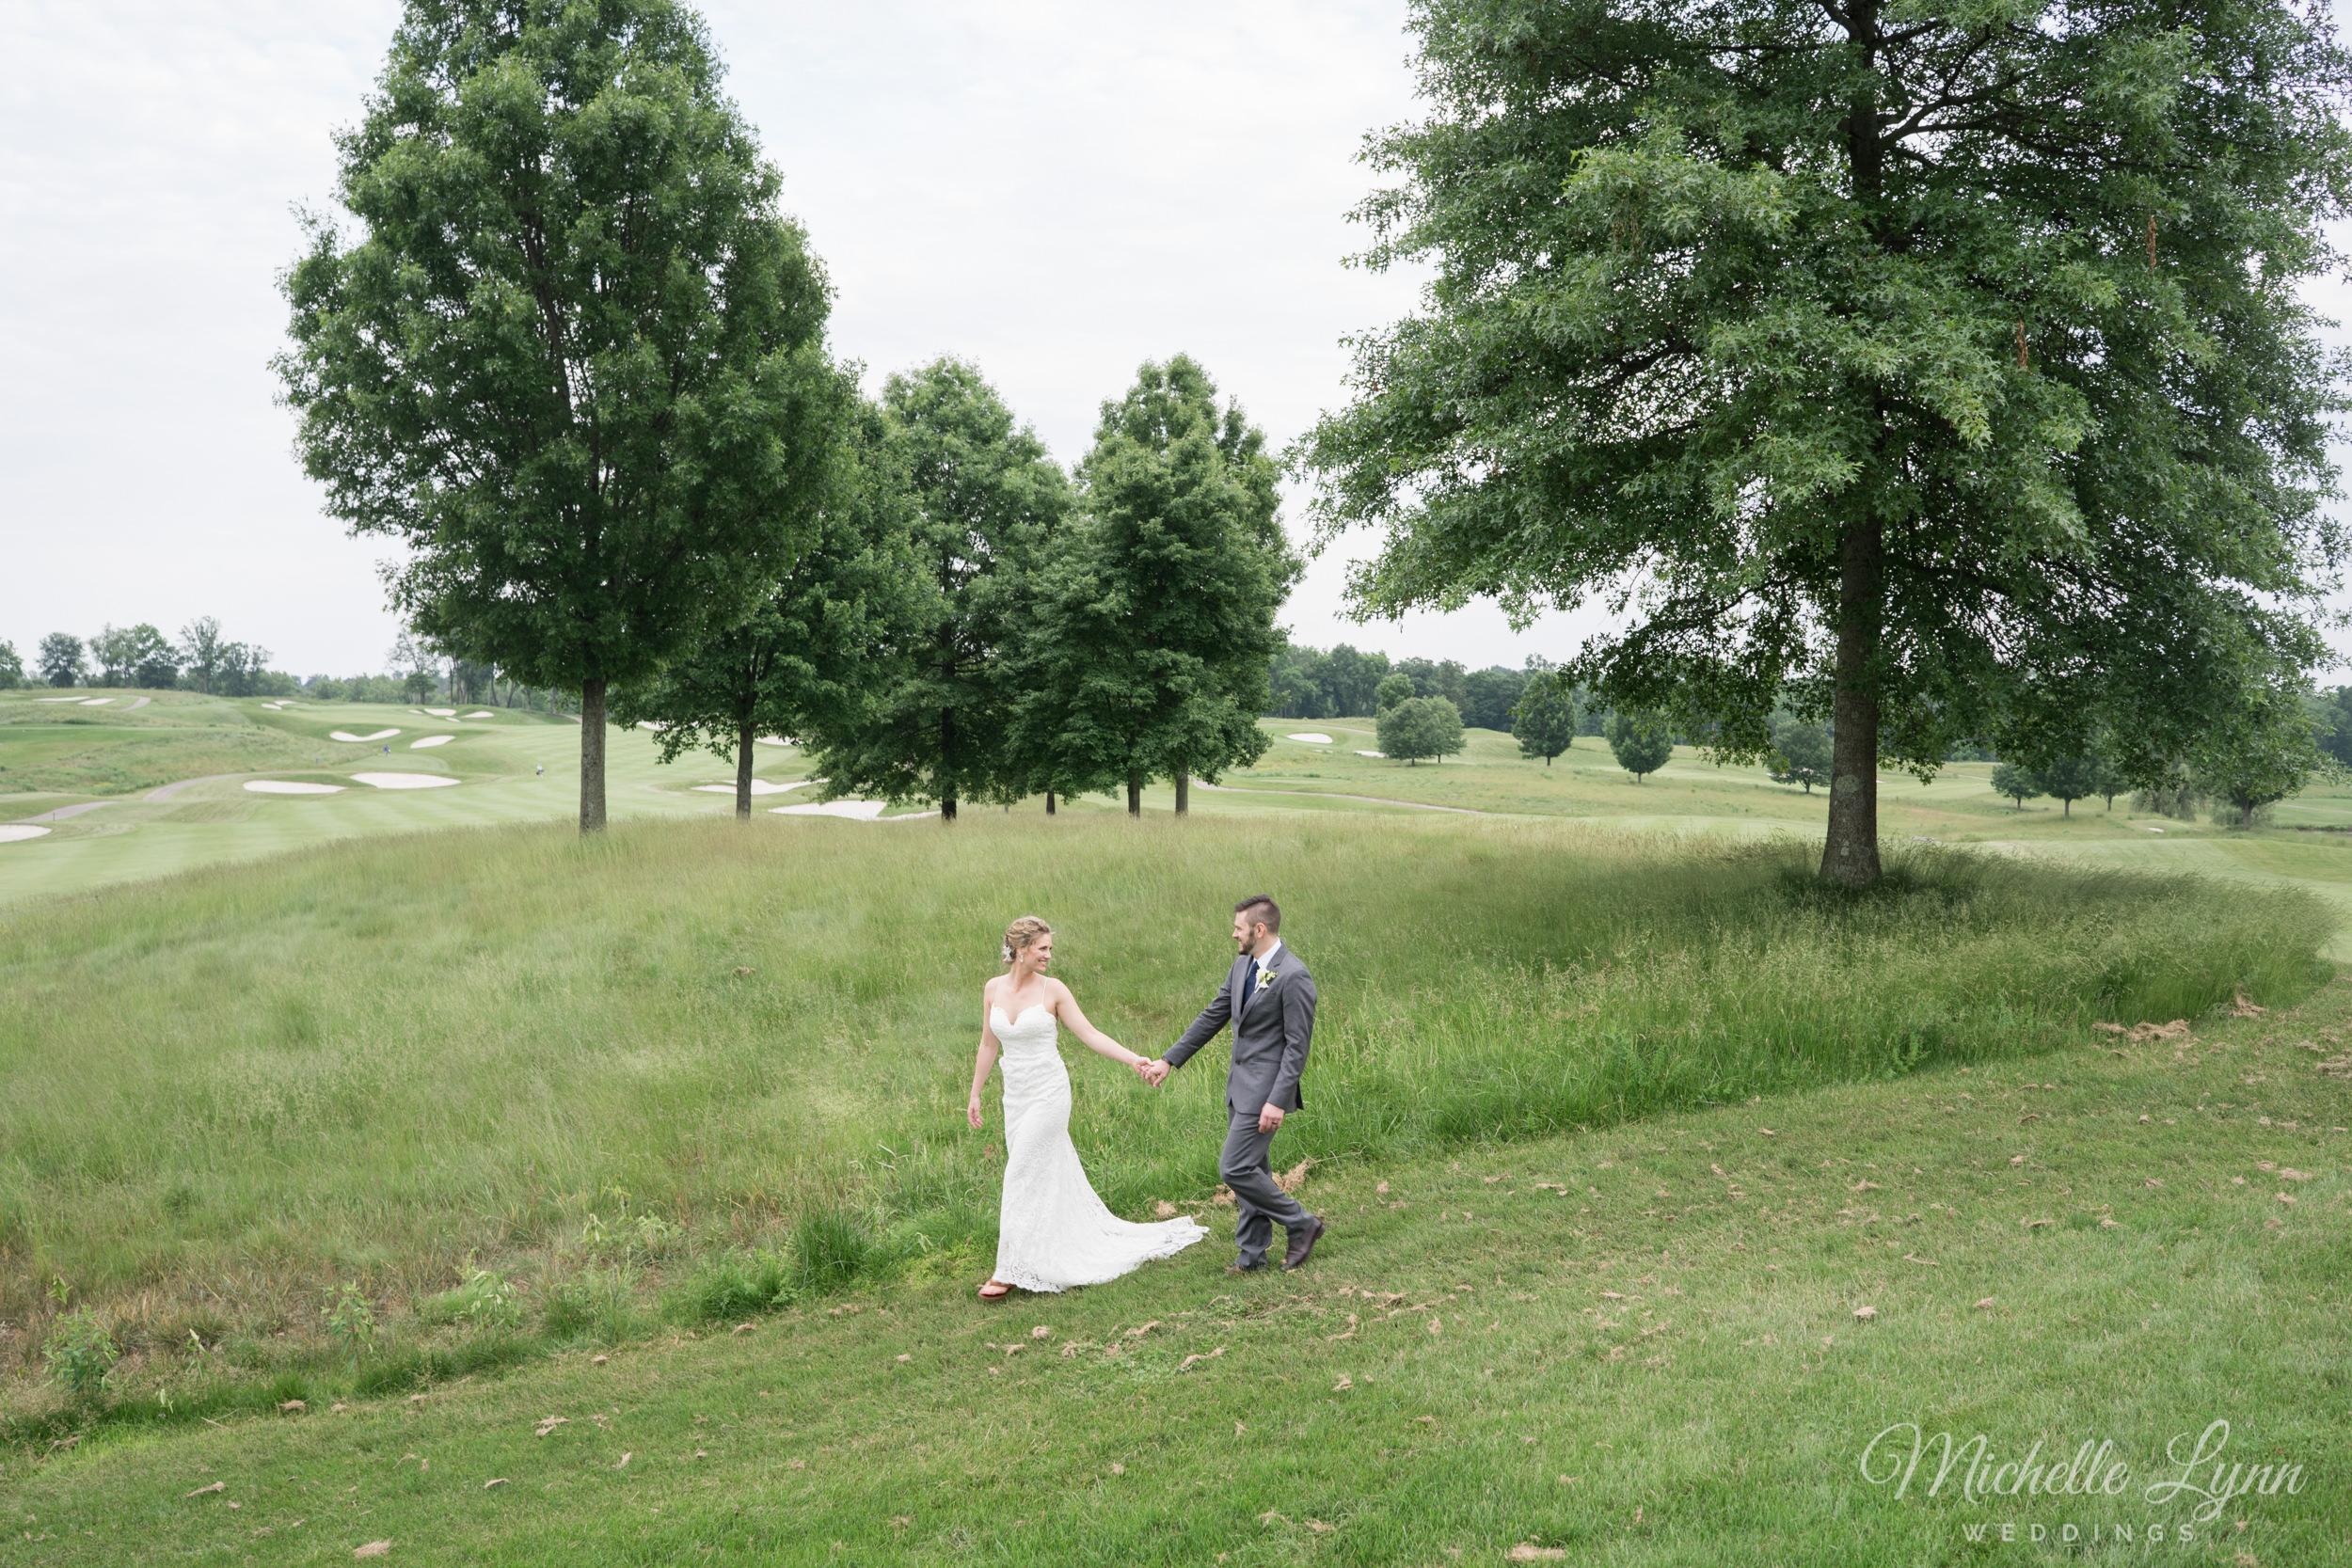 mlw-jericho-national-golf-club-wedding-photography-52.jpg